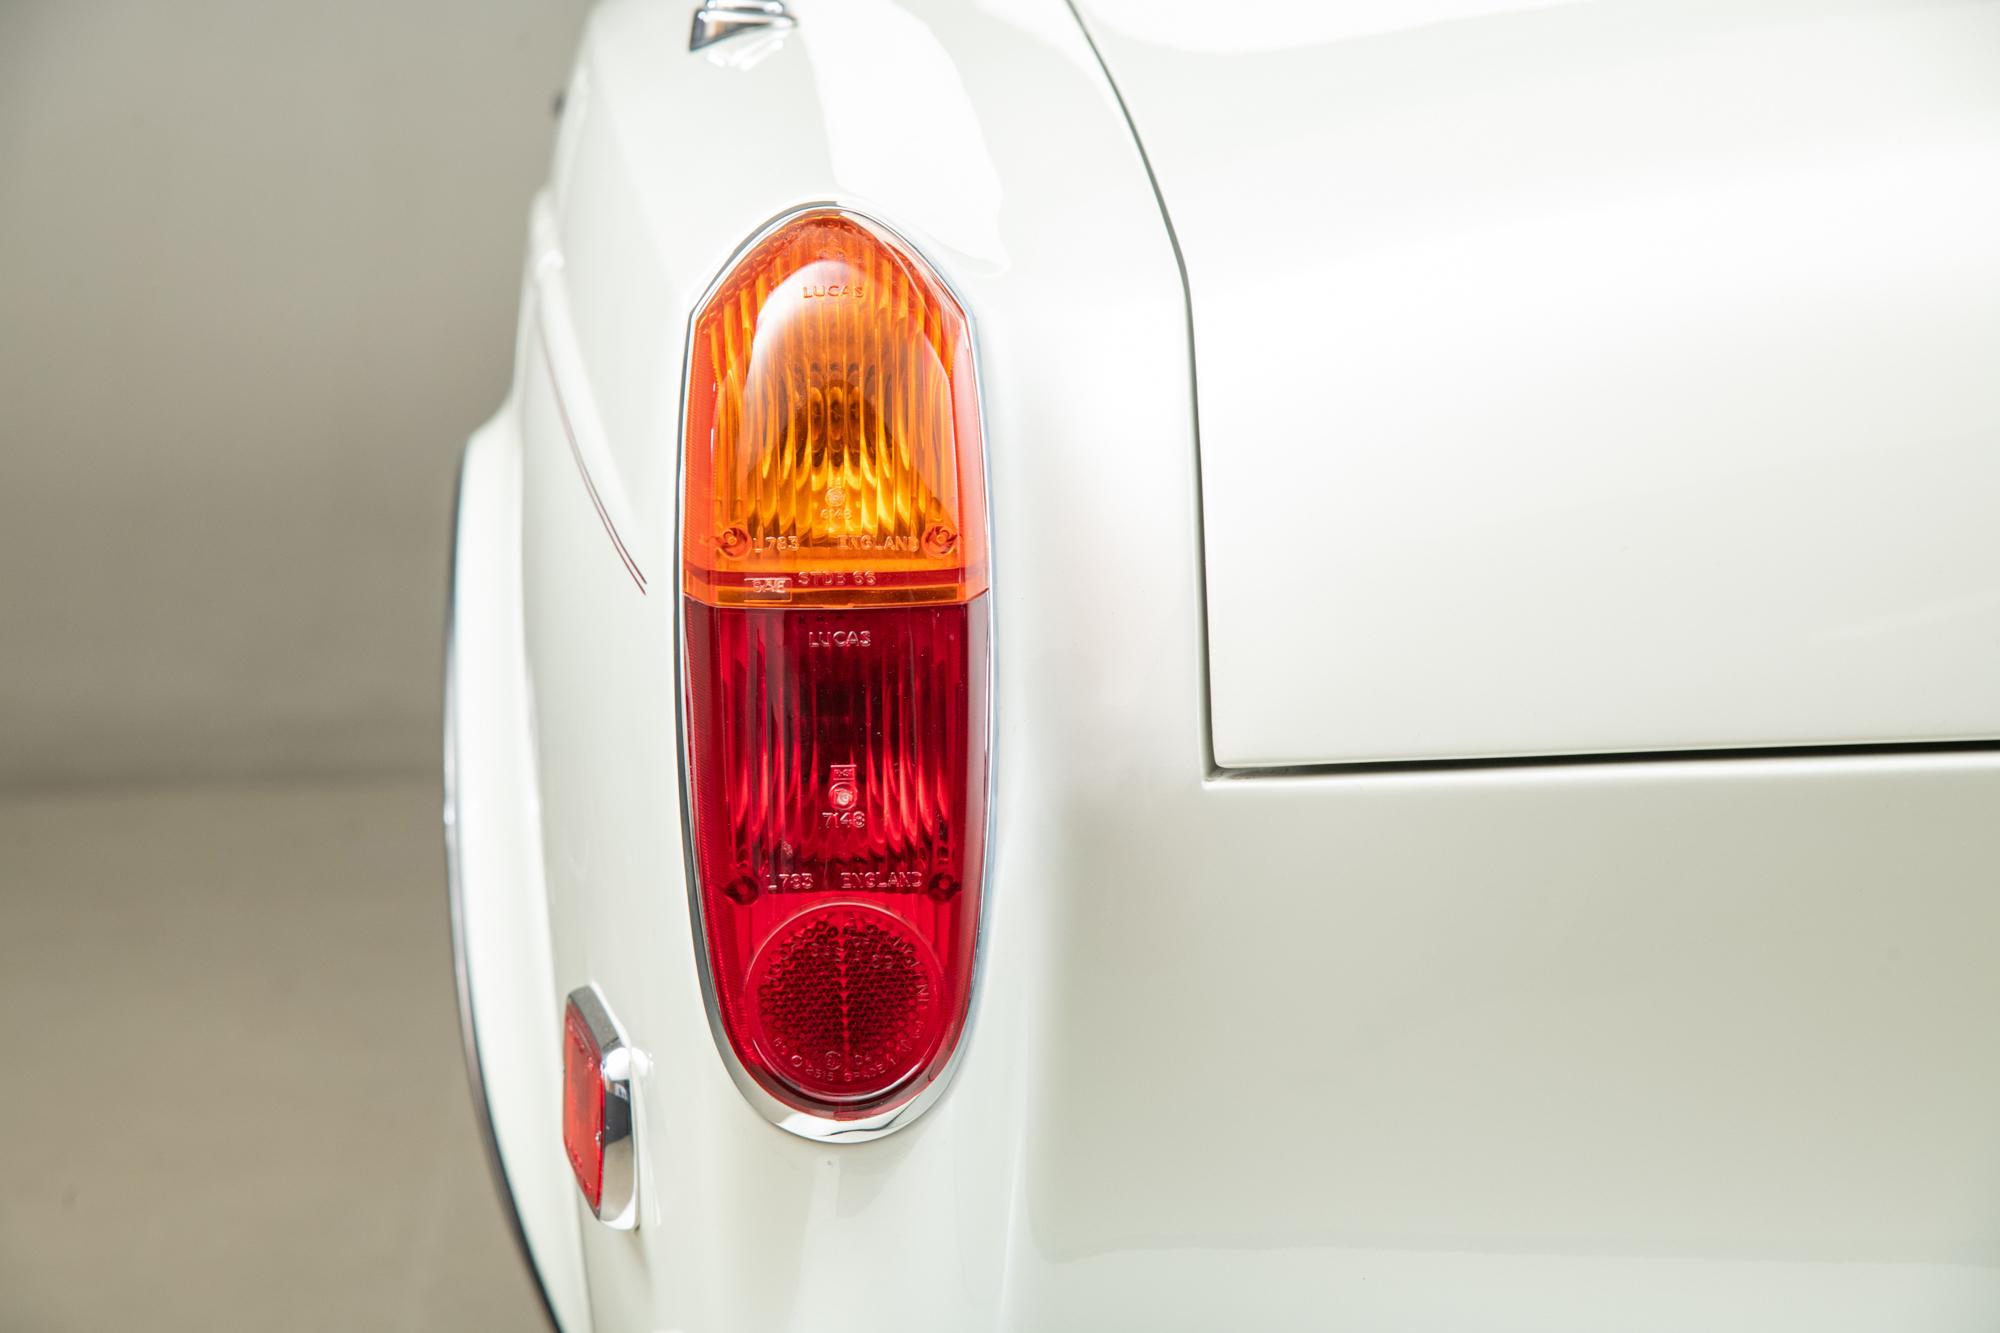 1994 Rolls Royce Corniche , WHITE METALLIC, VIN SCAZD02C7RCX50033, MILEAGE 9349